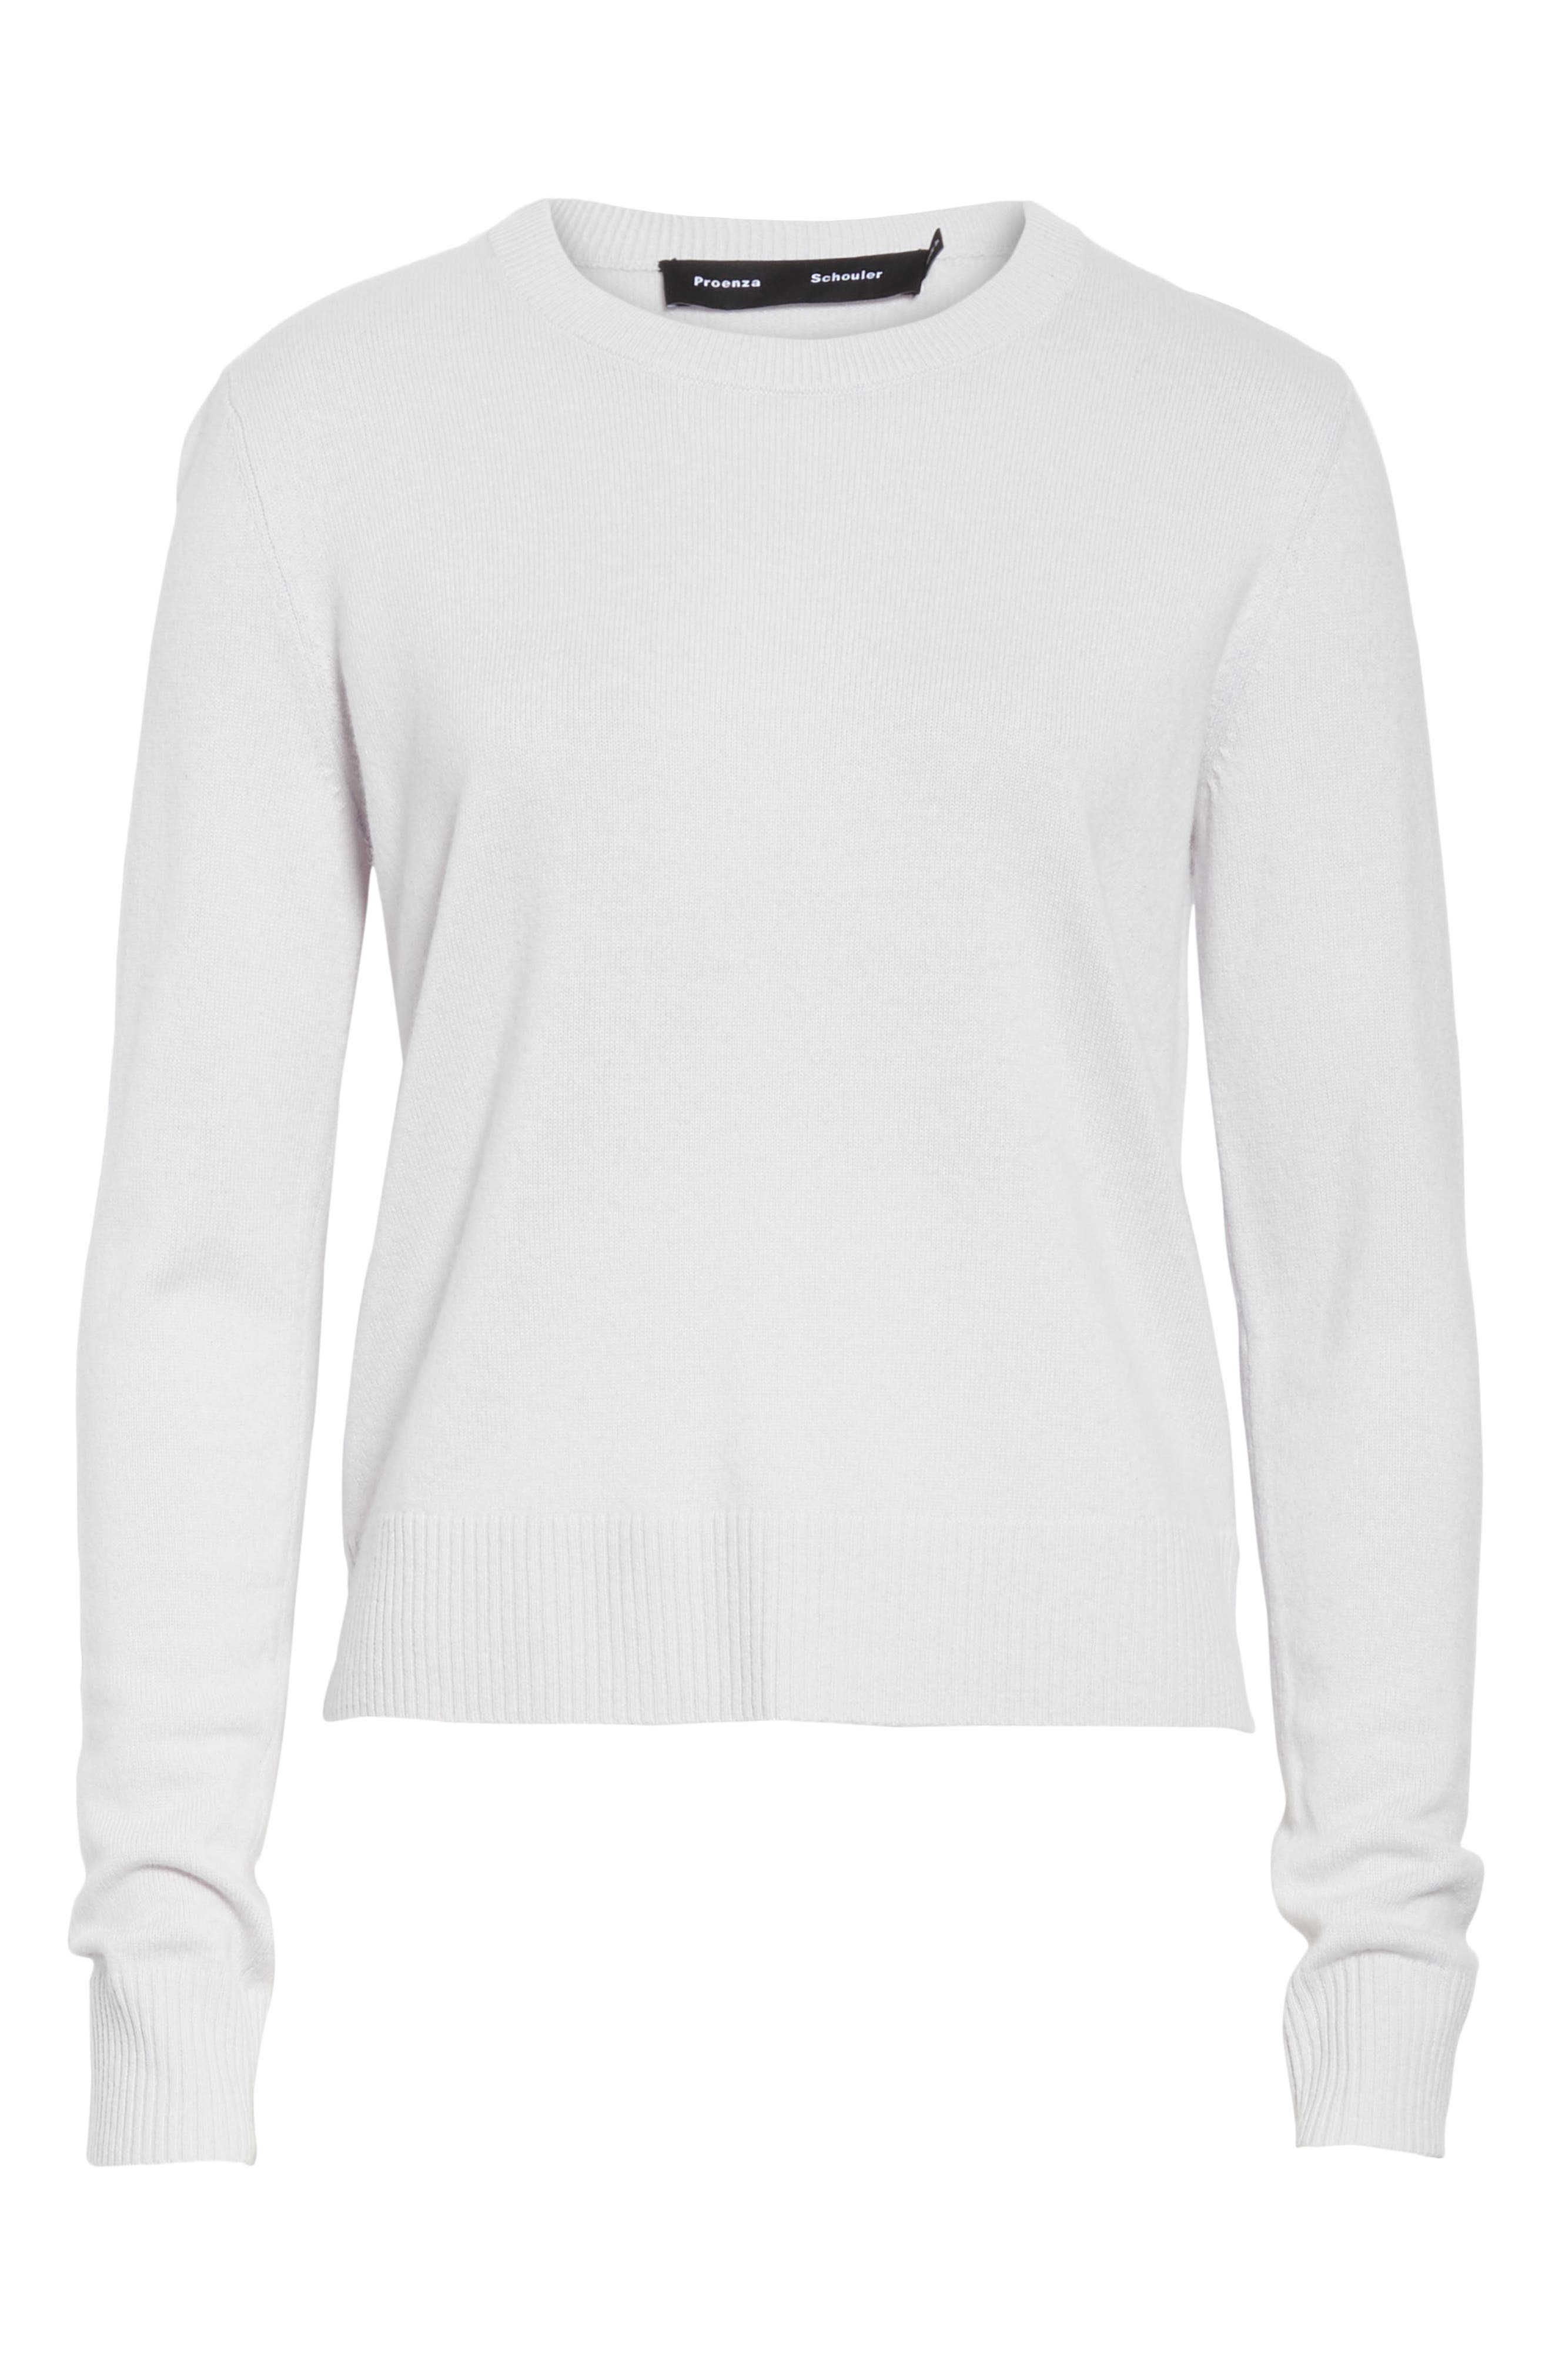 PROENZA SCHOULER, Cashmere Sweater, Alternate thumbnail 6, color, BLUE GREY